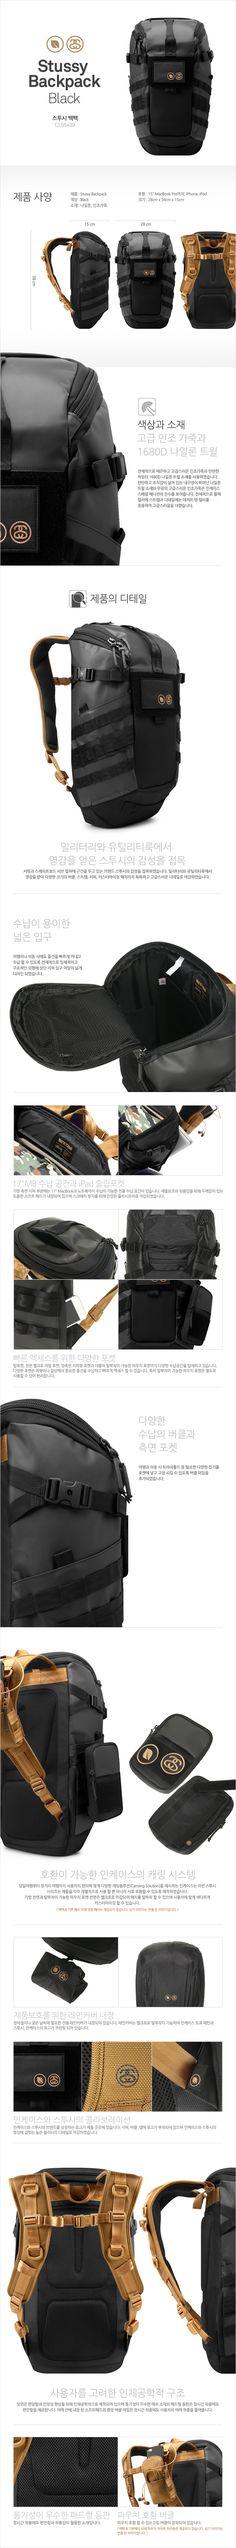 Stussy Backpack - Incase Korea.